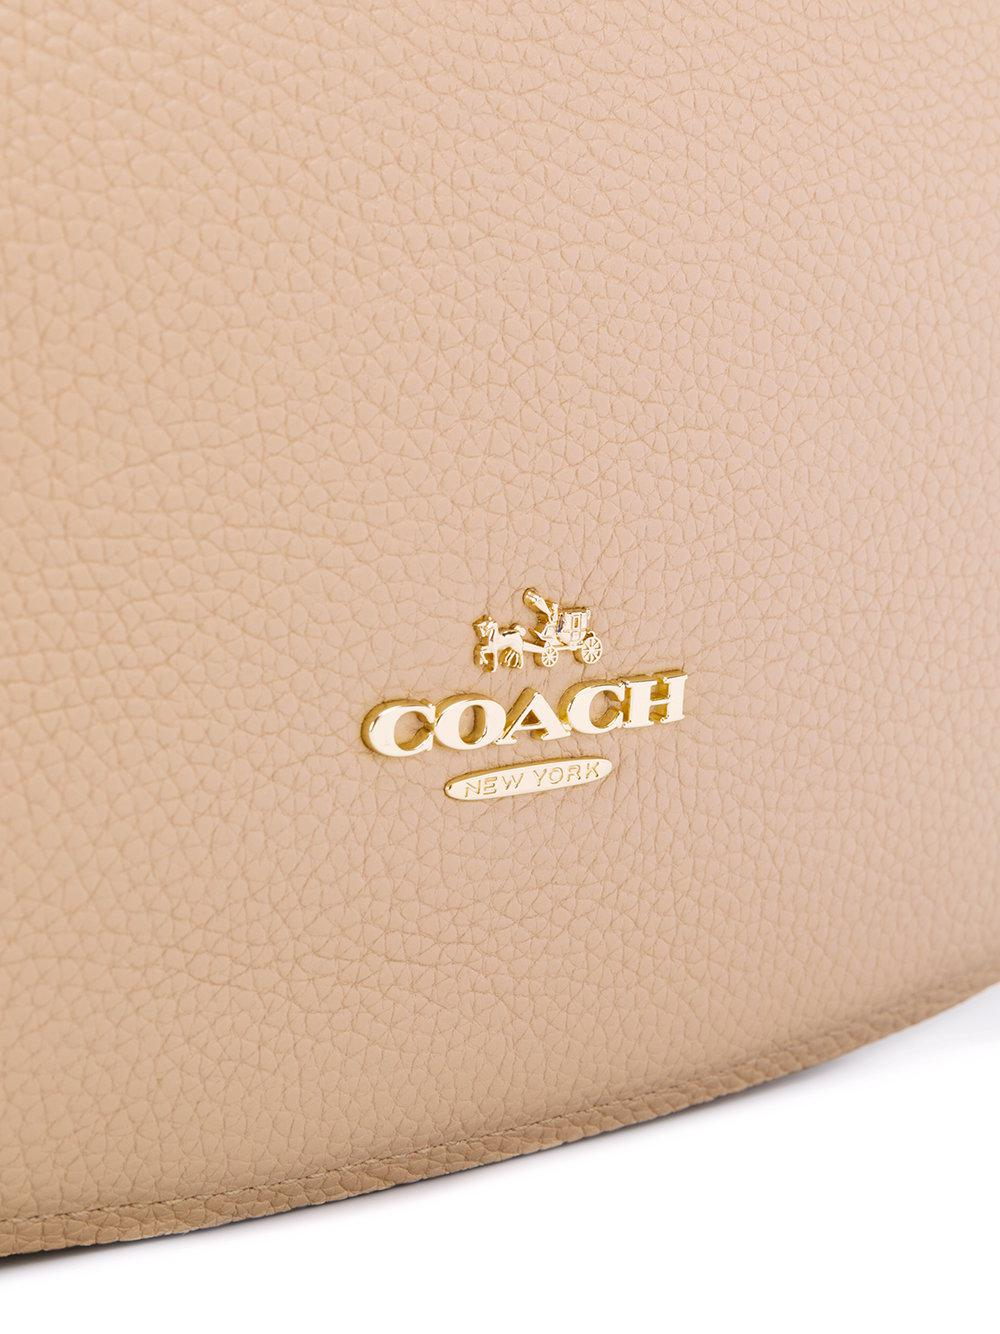 COACH Leather Chelsea Crossbody Bag